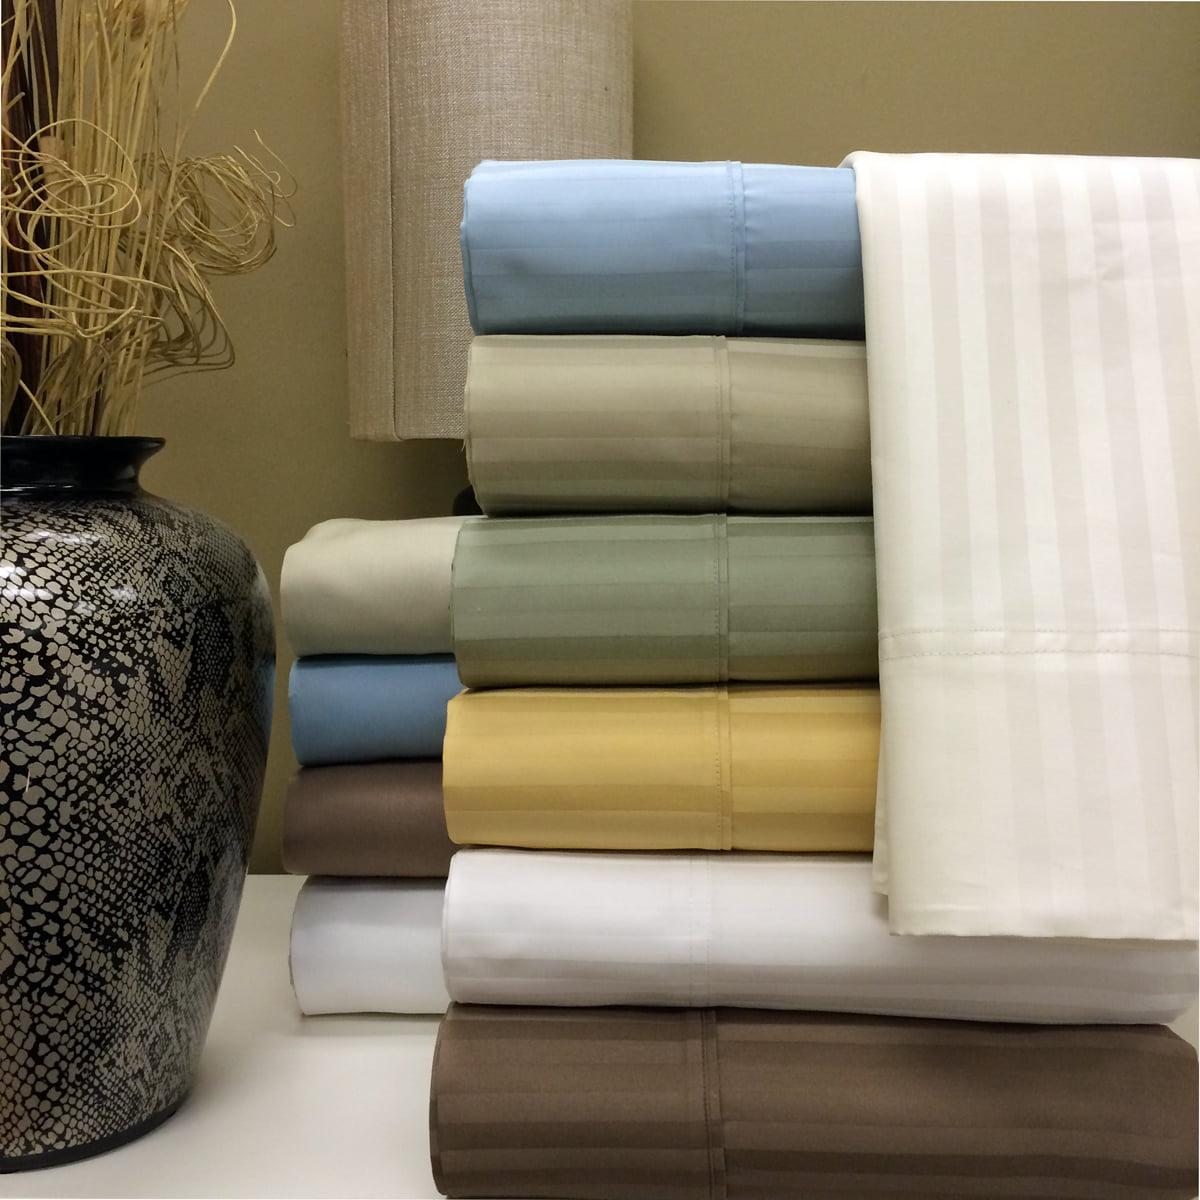 1000 Thread Count Sheets, Damask Stripe 100% Long Staple Cotton Sateen Deep Pocket Sheet Set - Queen - White